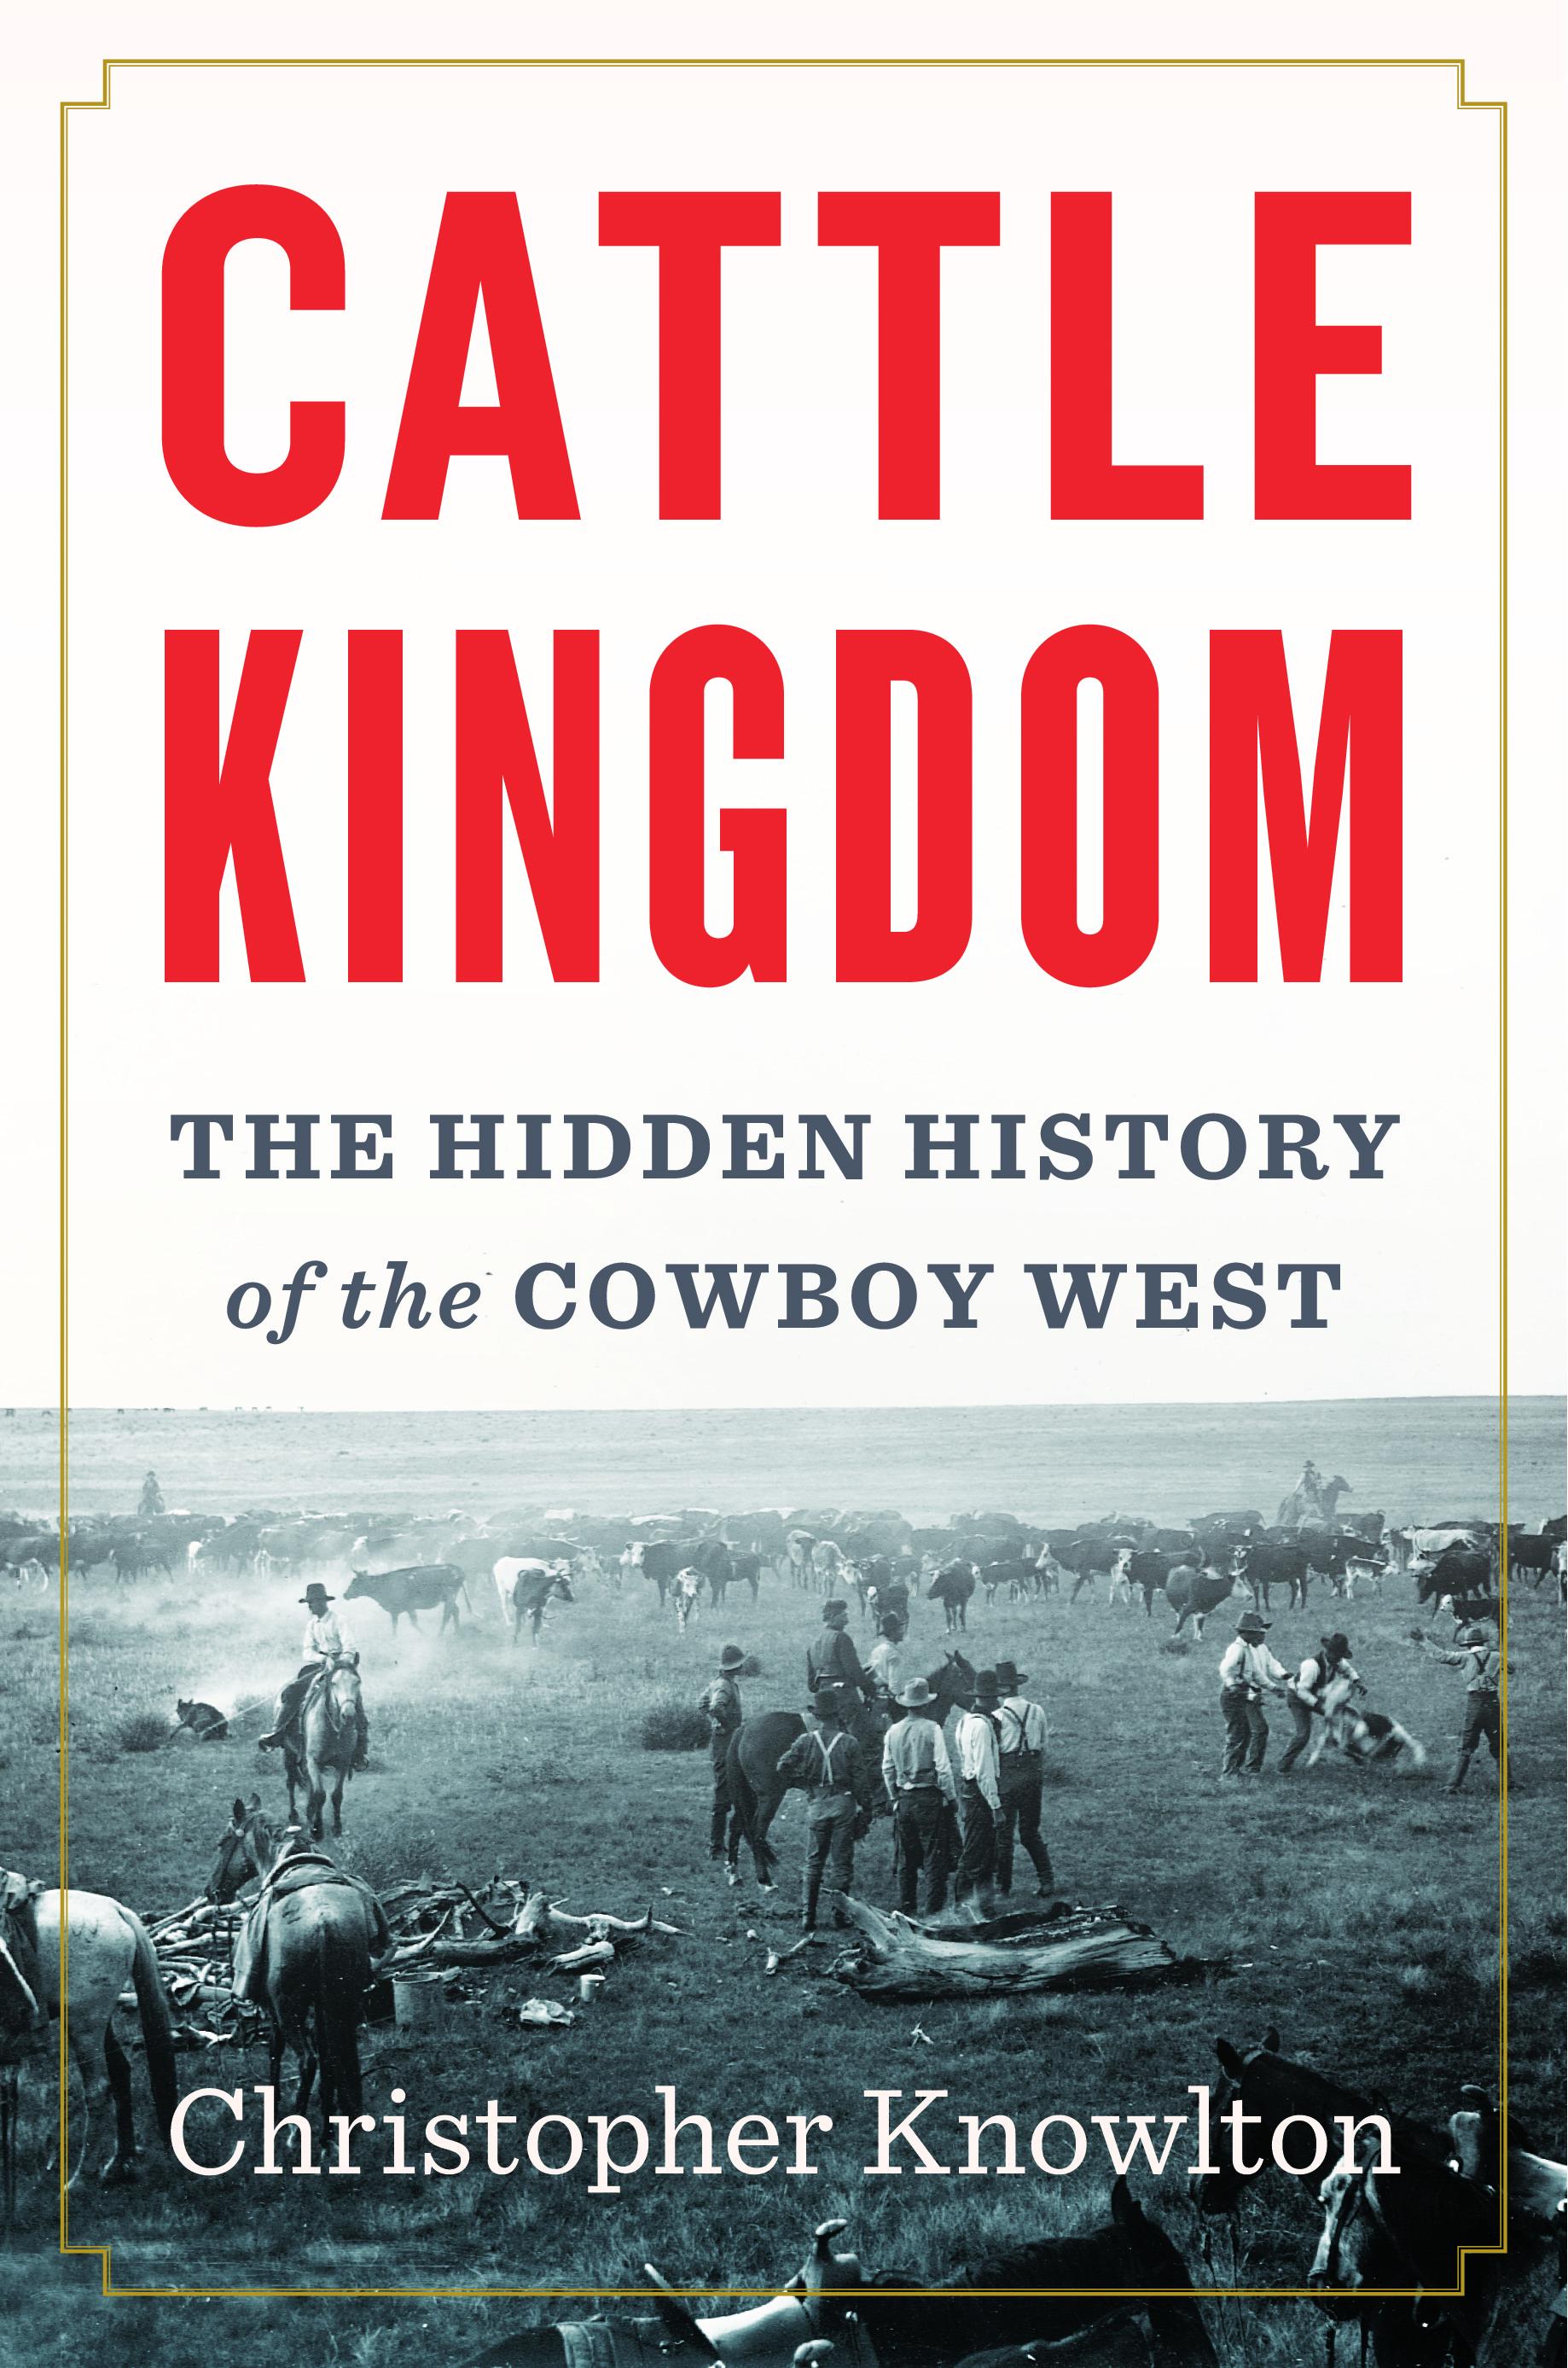 Book_Knowlton-Christopher_Cattle-Kingdom_1.jpg